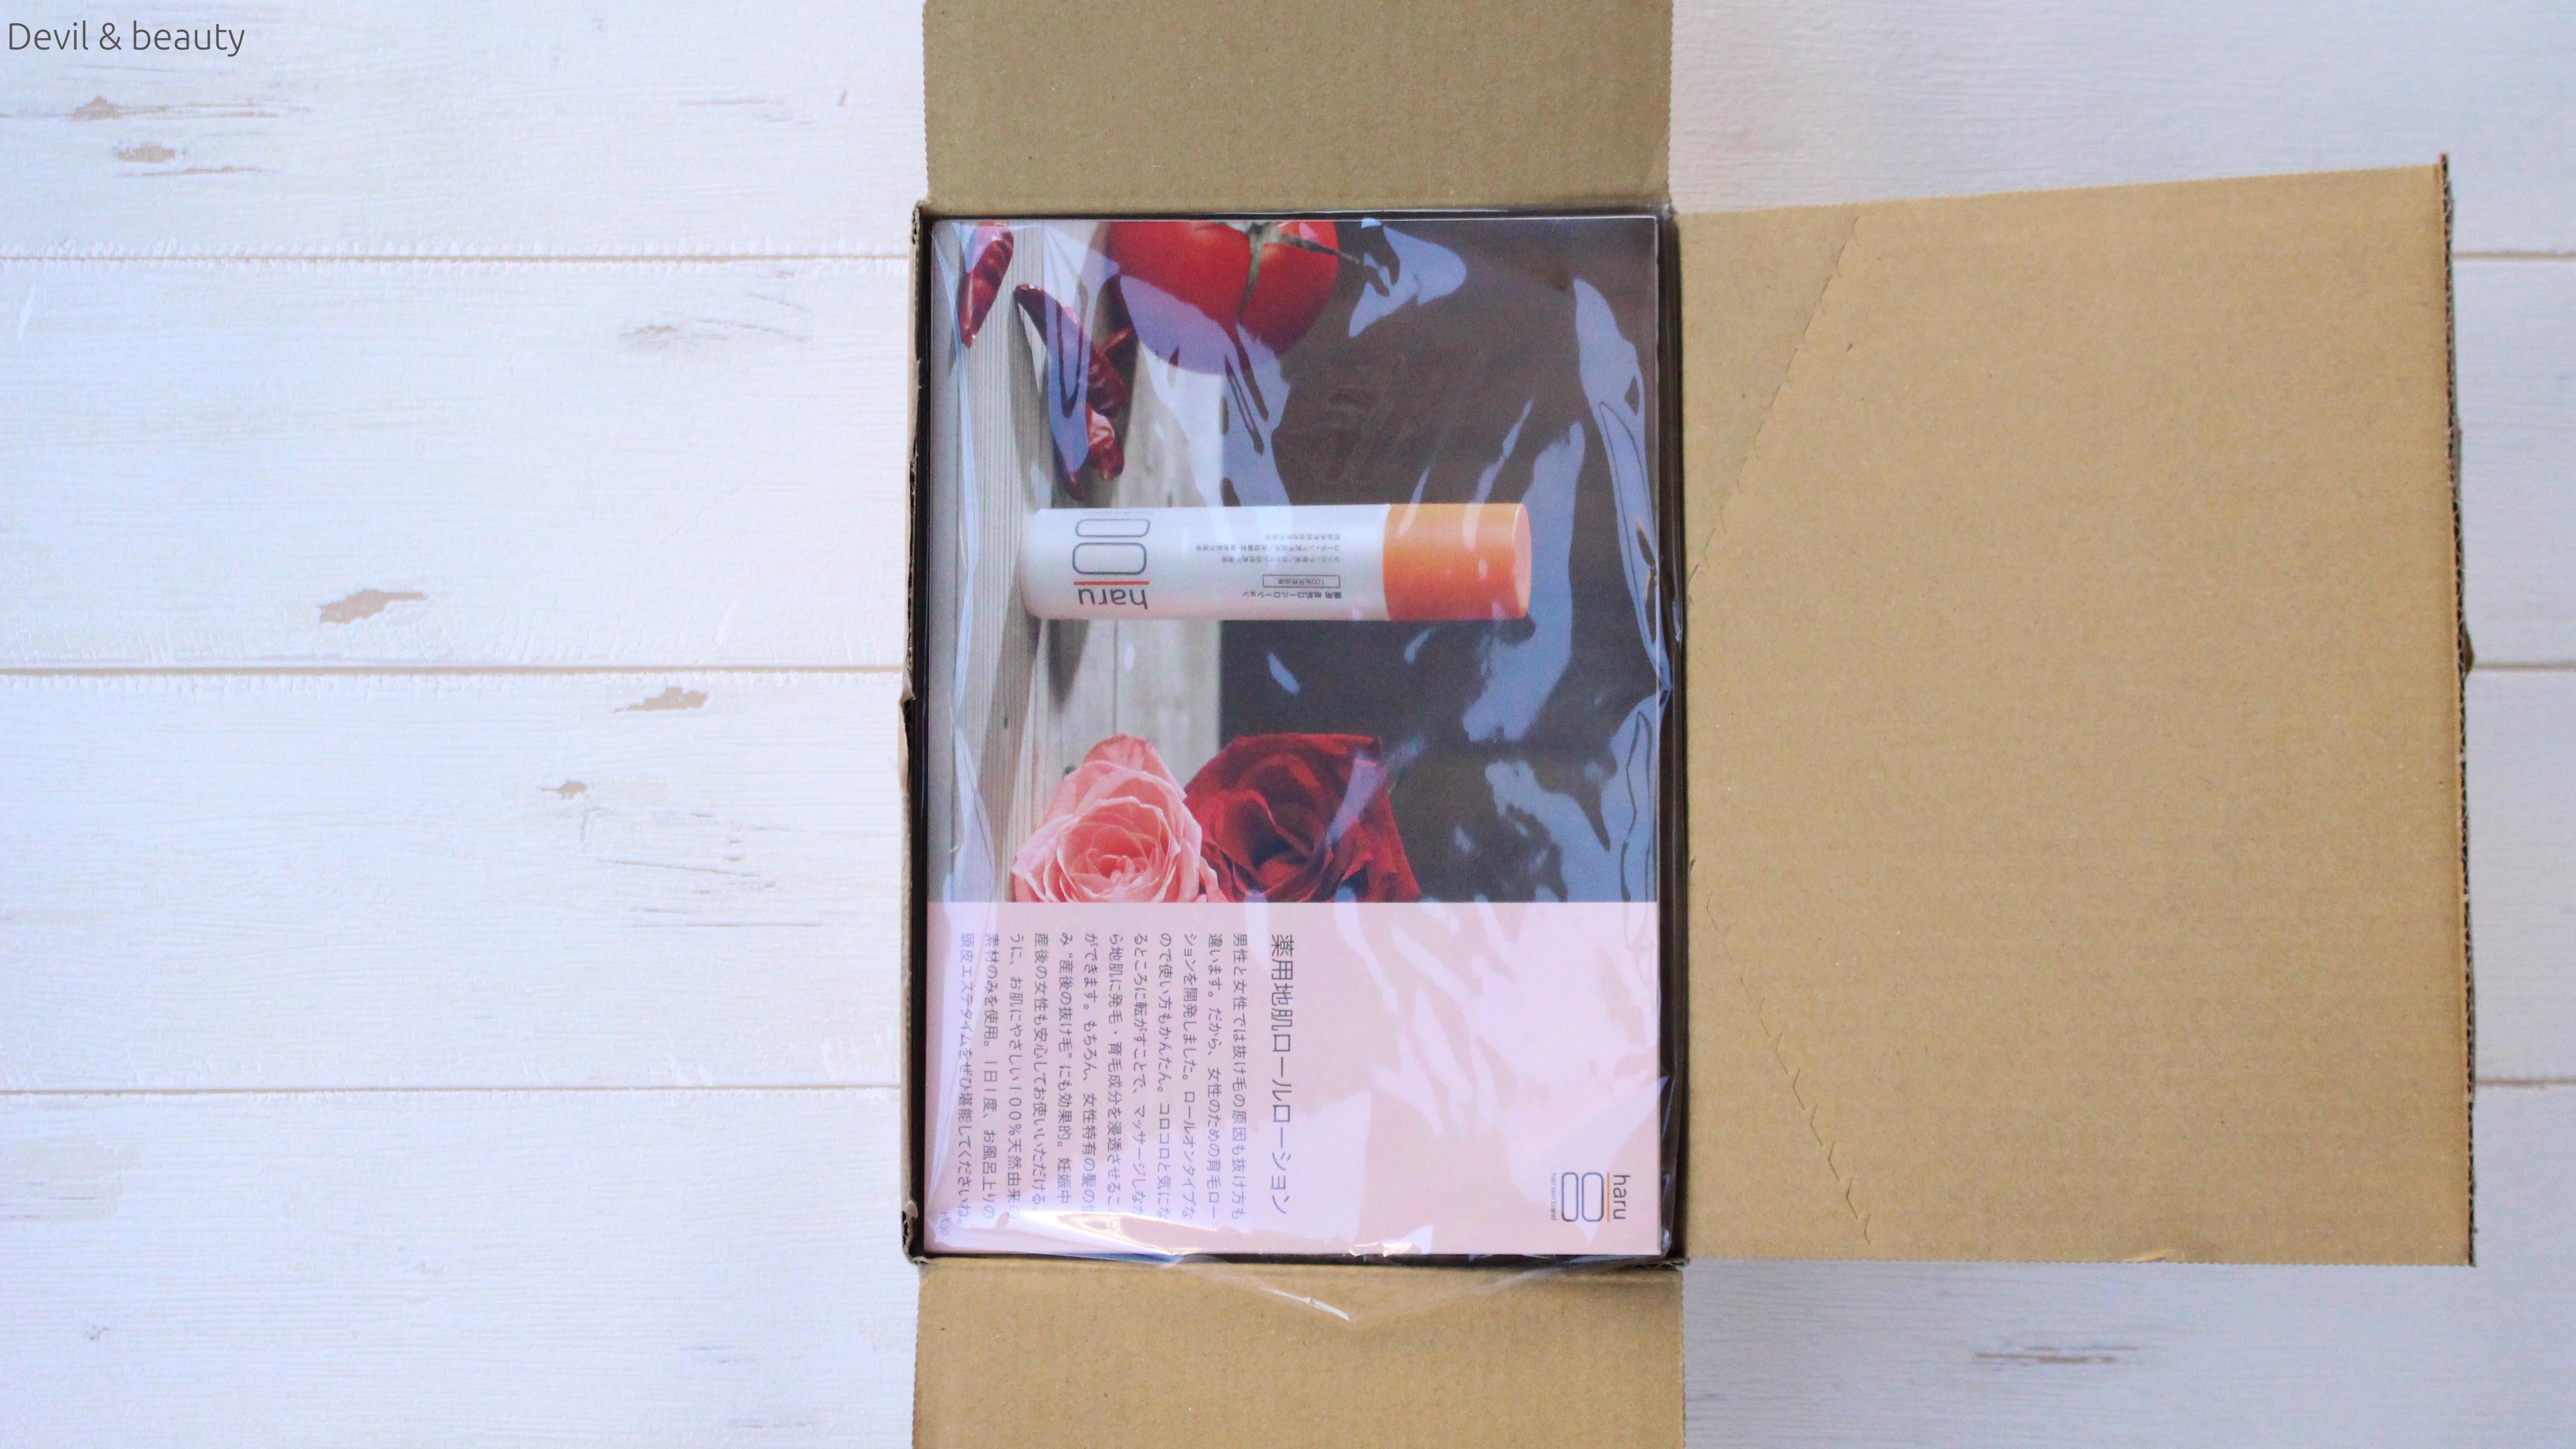 haru-skin-roll-lotion2 - image